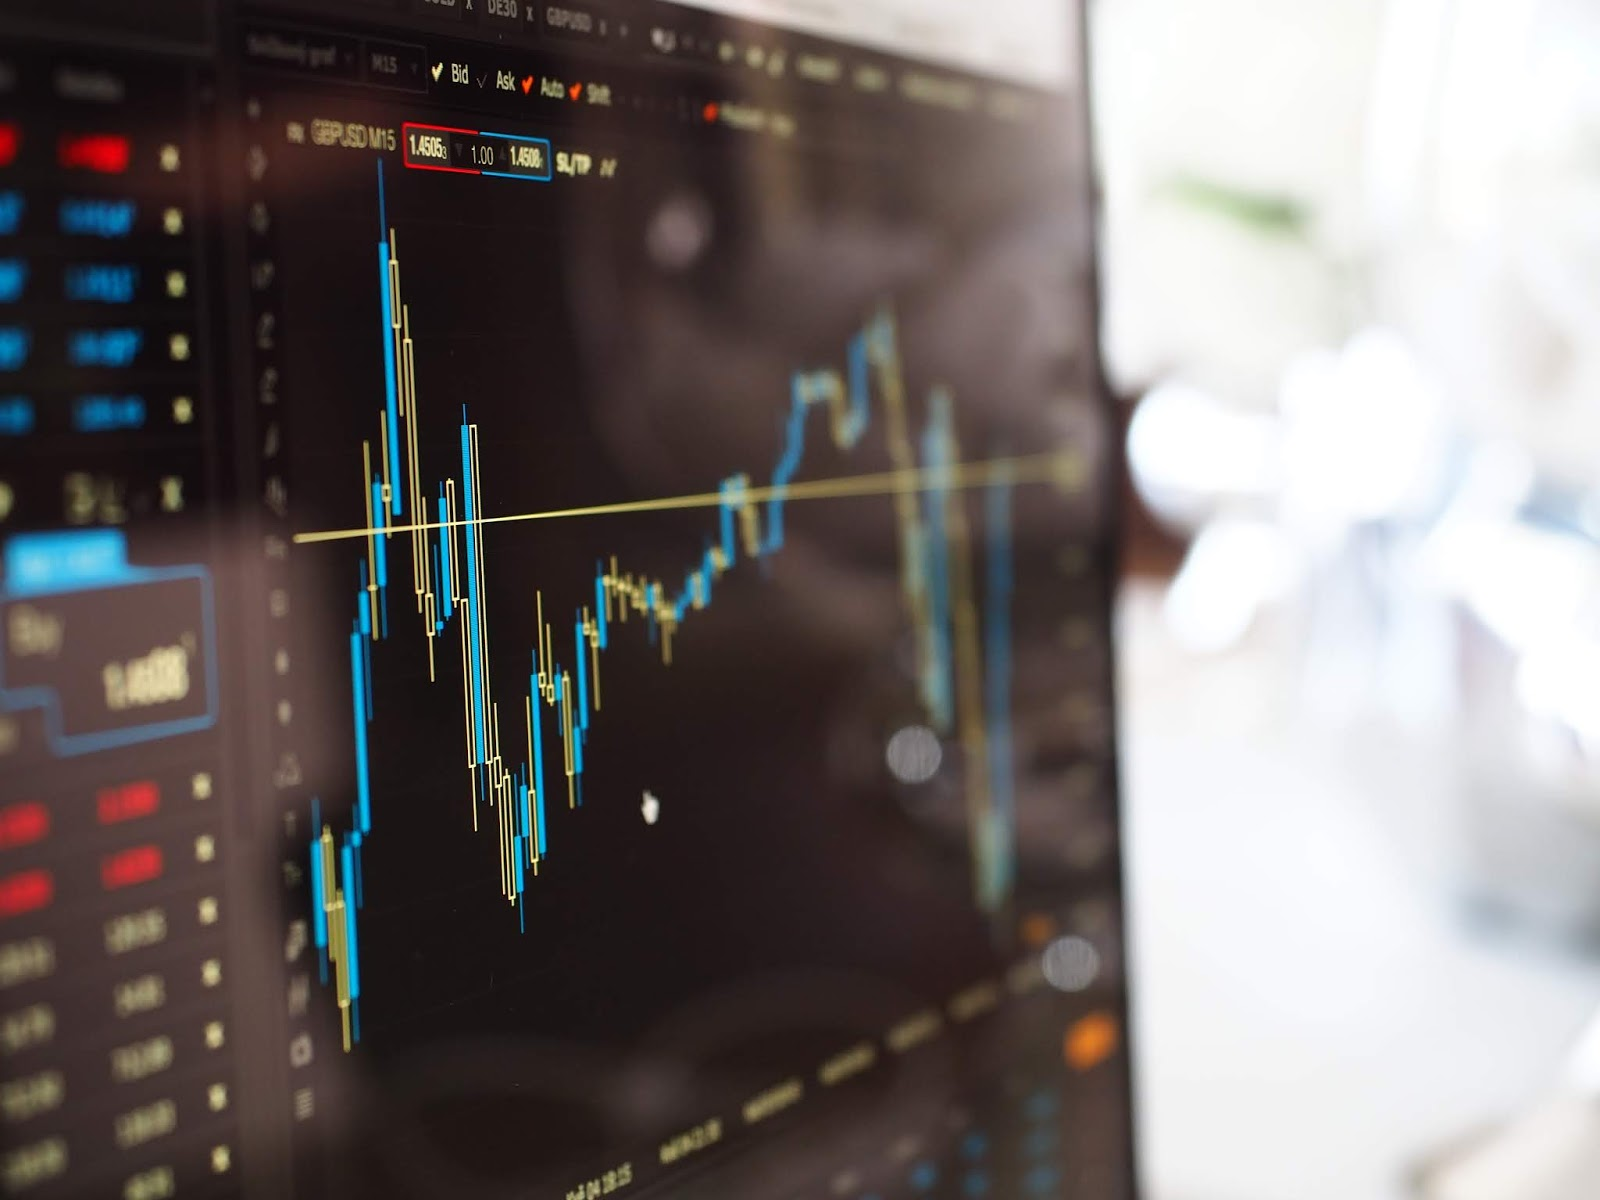 Форекс прогноз основных валютных пар на 10 апреля